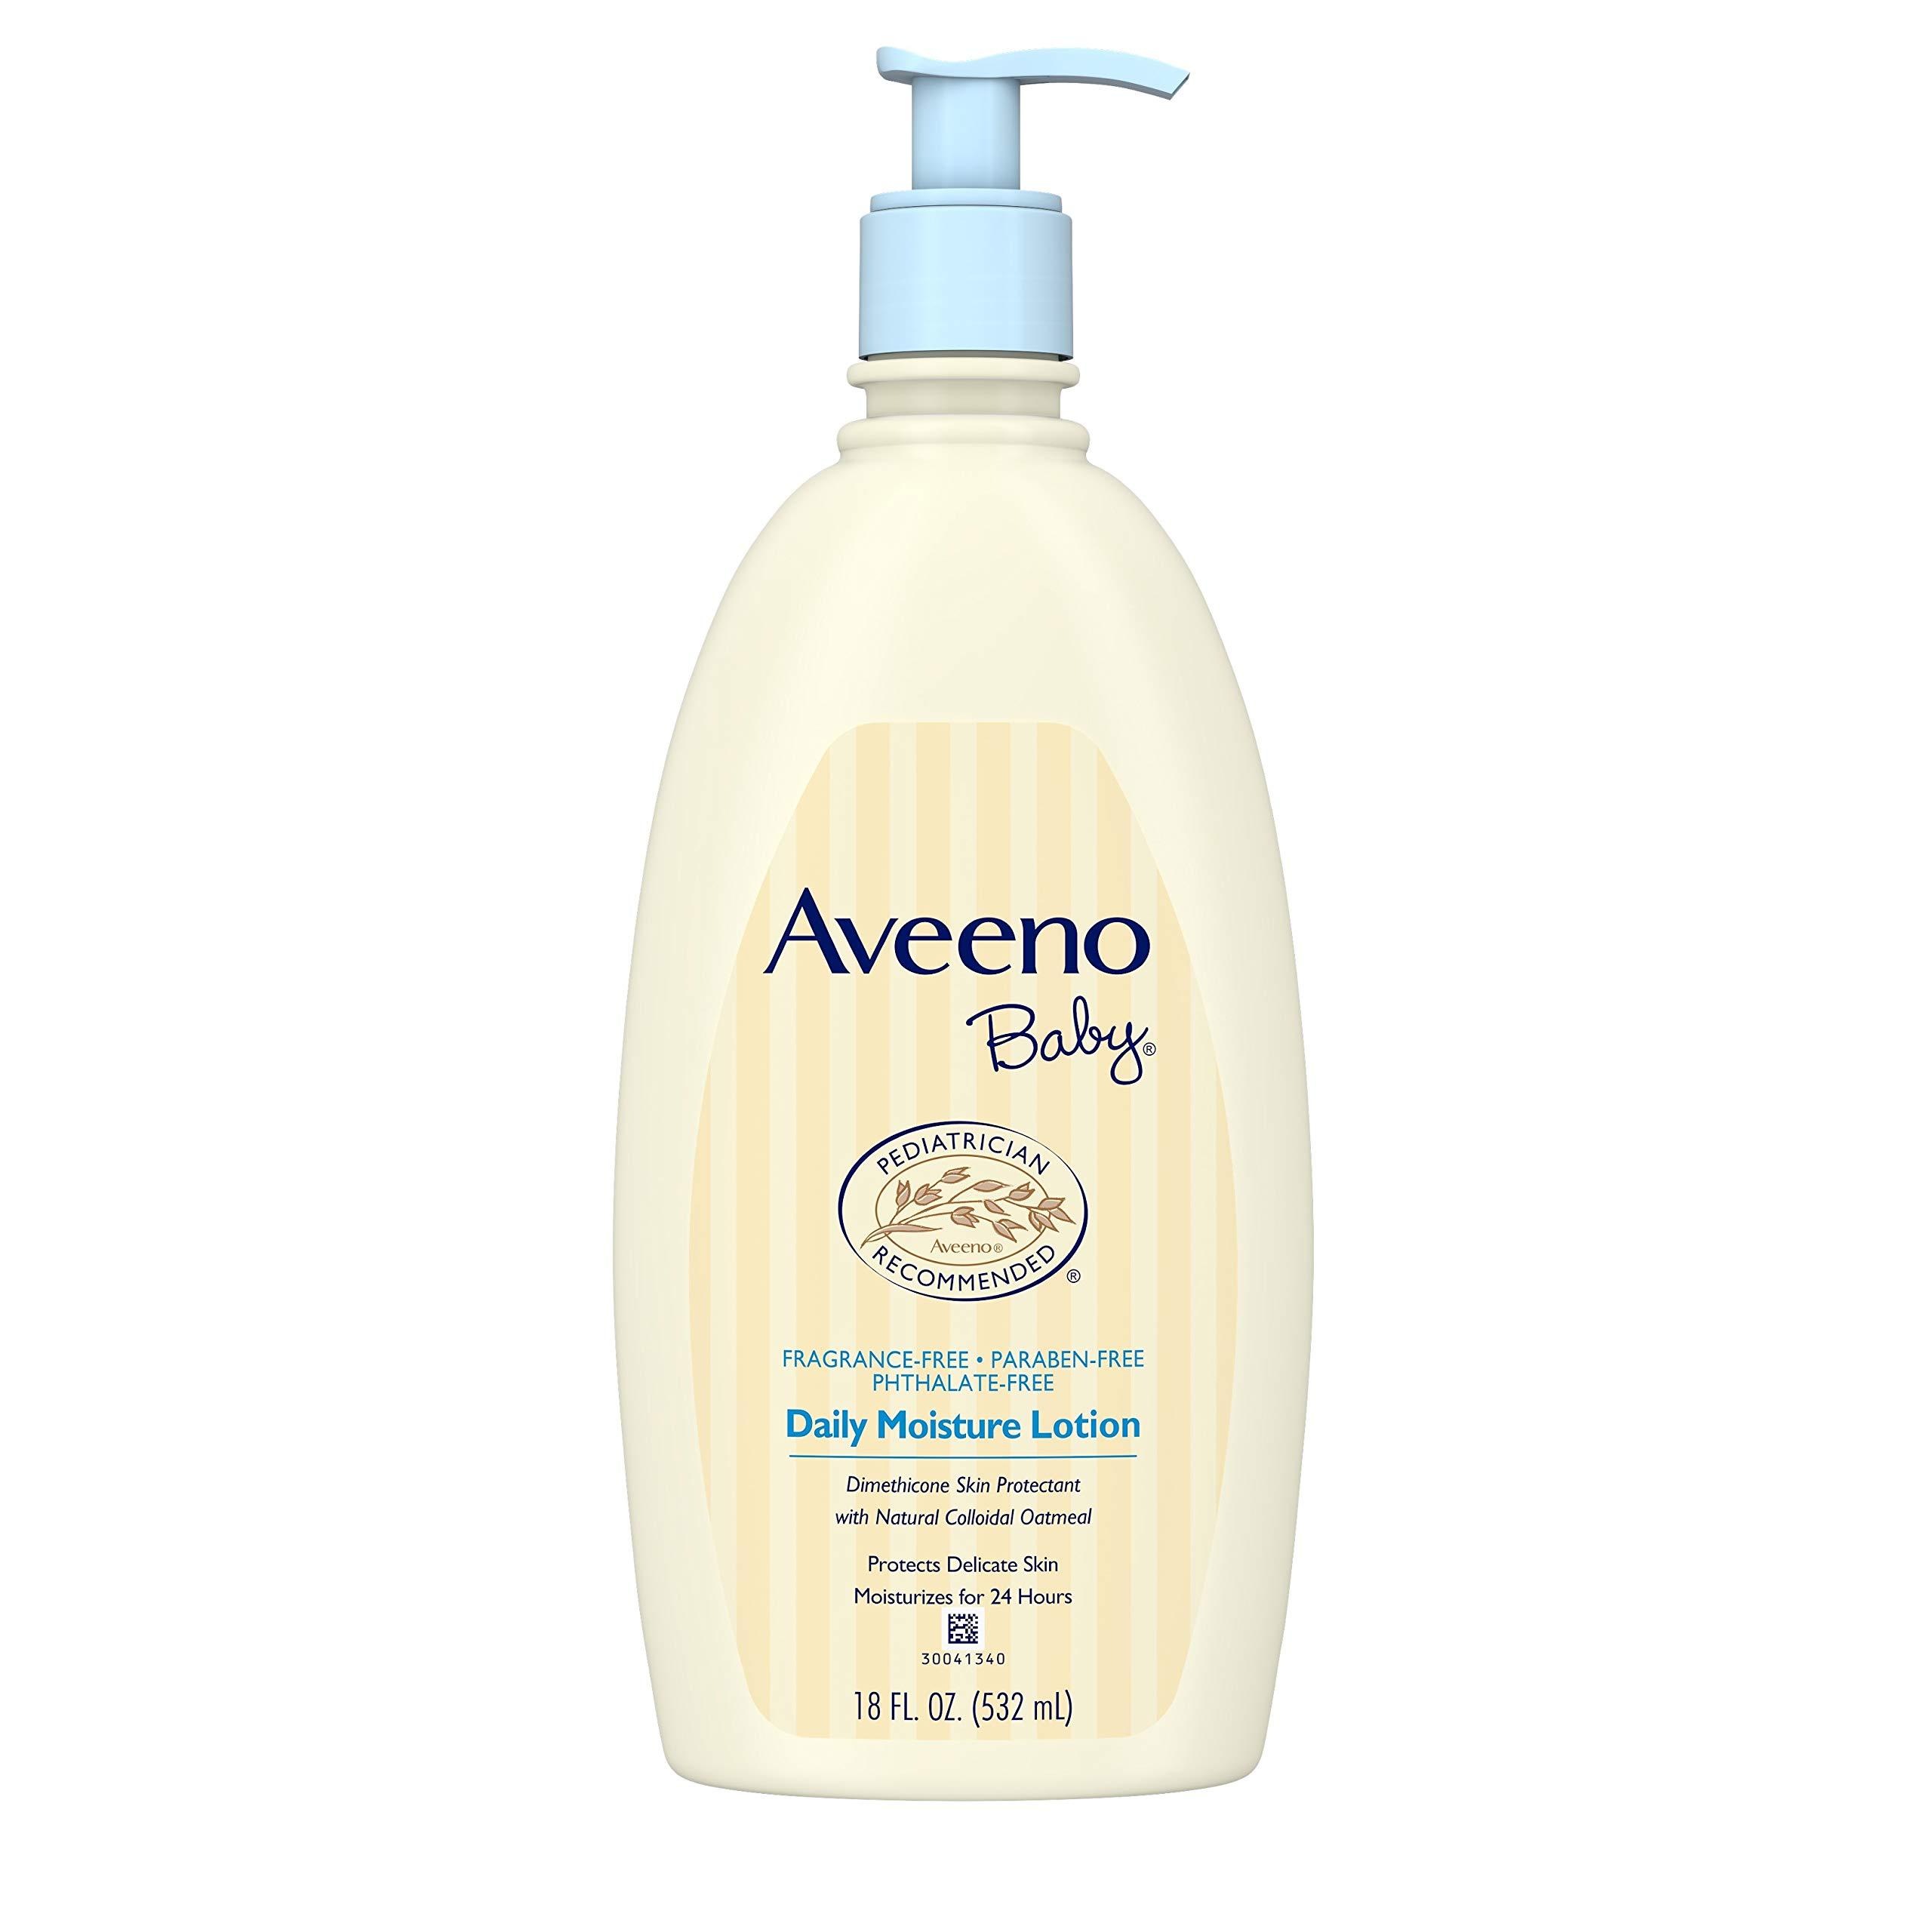 Aveeno艾维诺  婴儿保湿润肤乳液    18 液体盎司  532ml